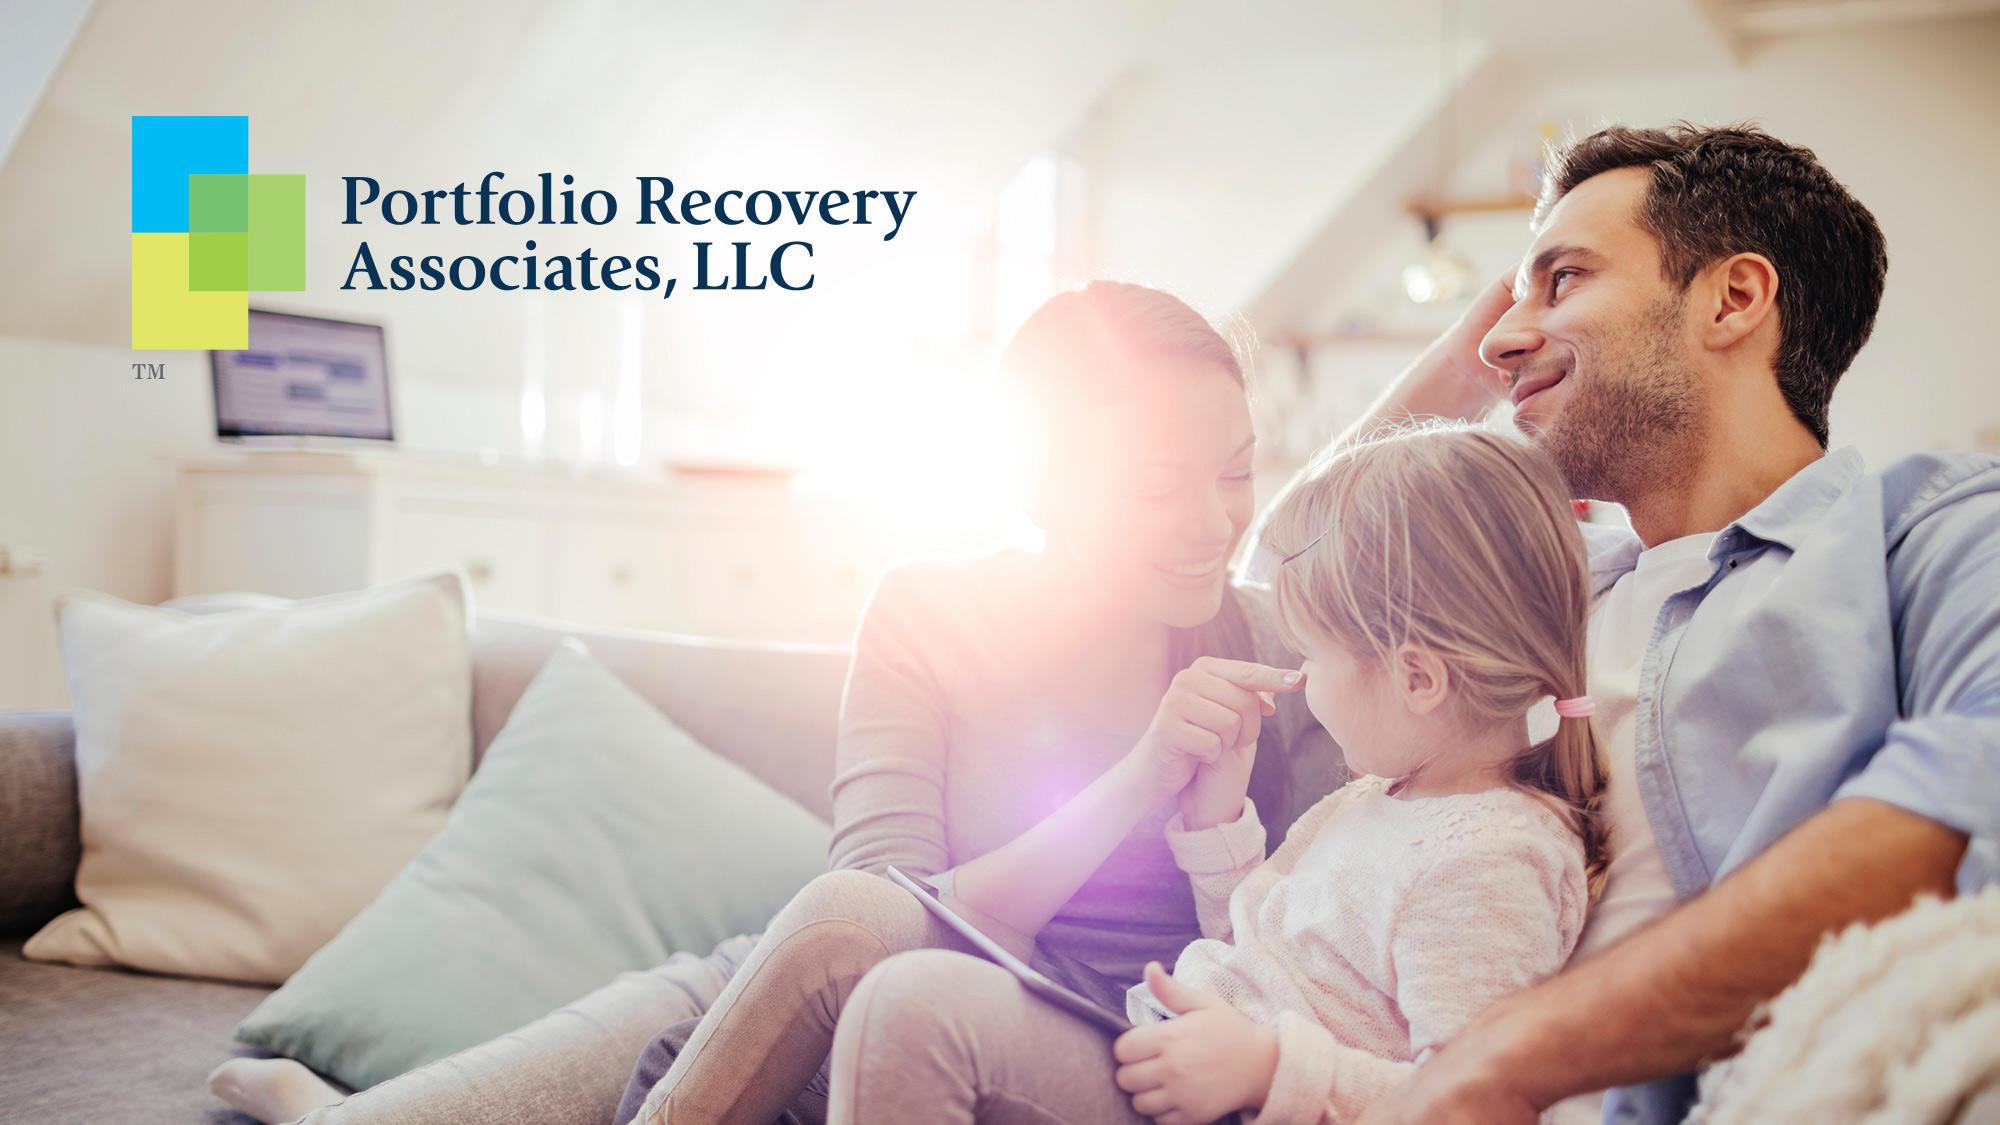 Portfolio Recovery Associates, LLC image 0